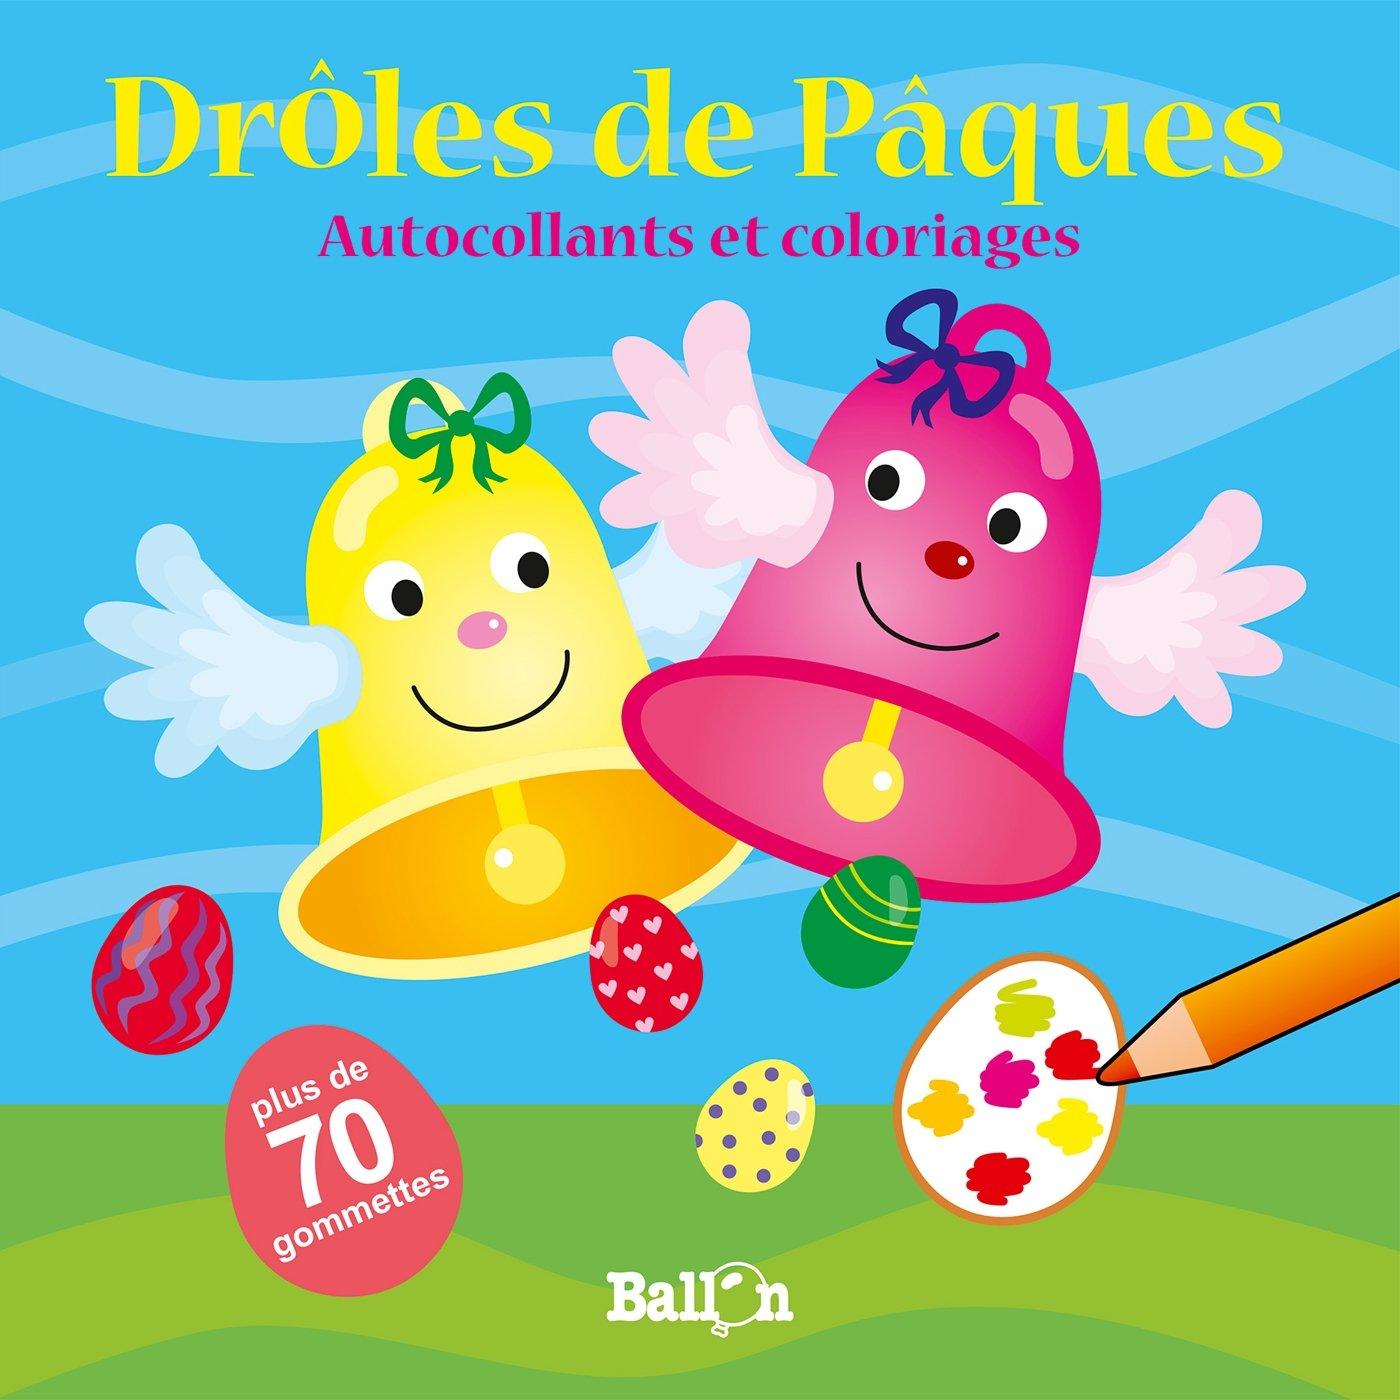 Droles De Paques Amazon Fr Ballon Livres